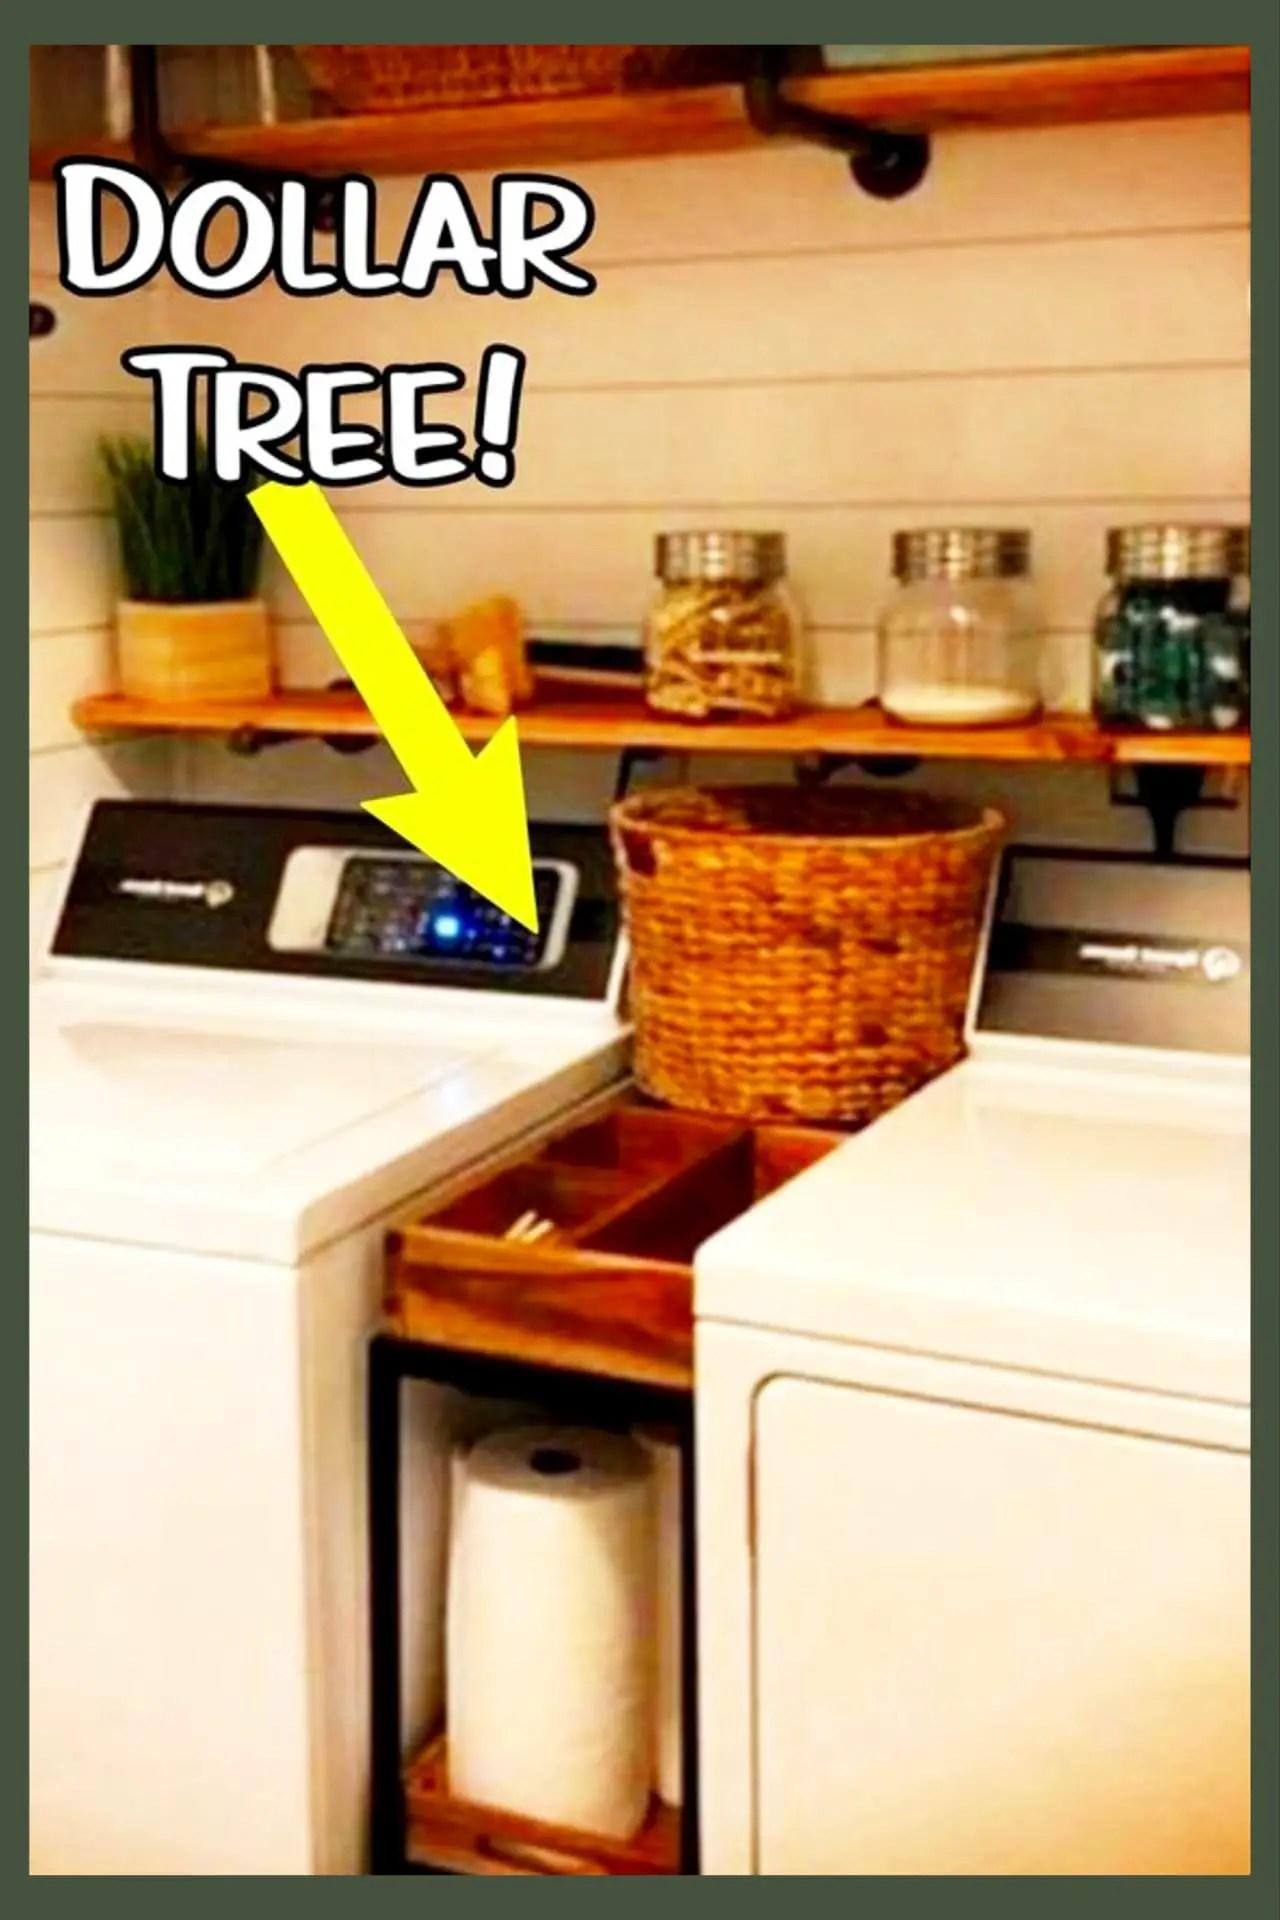 Small Laundry Room Ideas - Space Saving Ideas for Tiny ... on Small Laundry Room Organization Ideas  id=97738